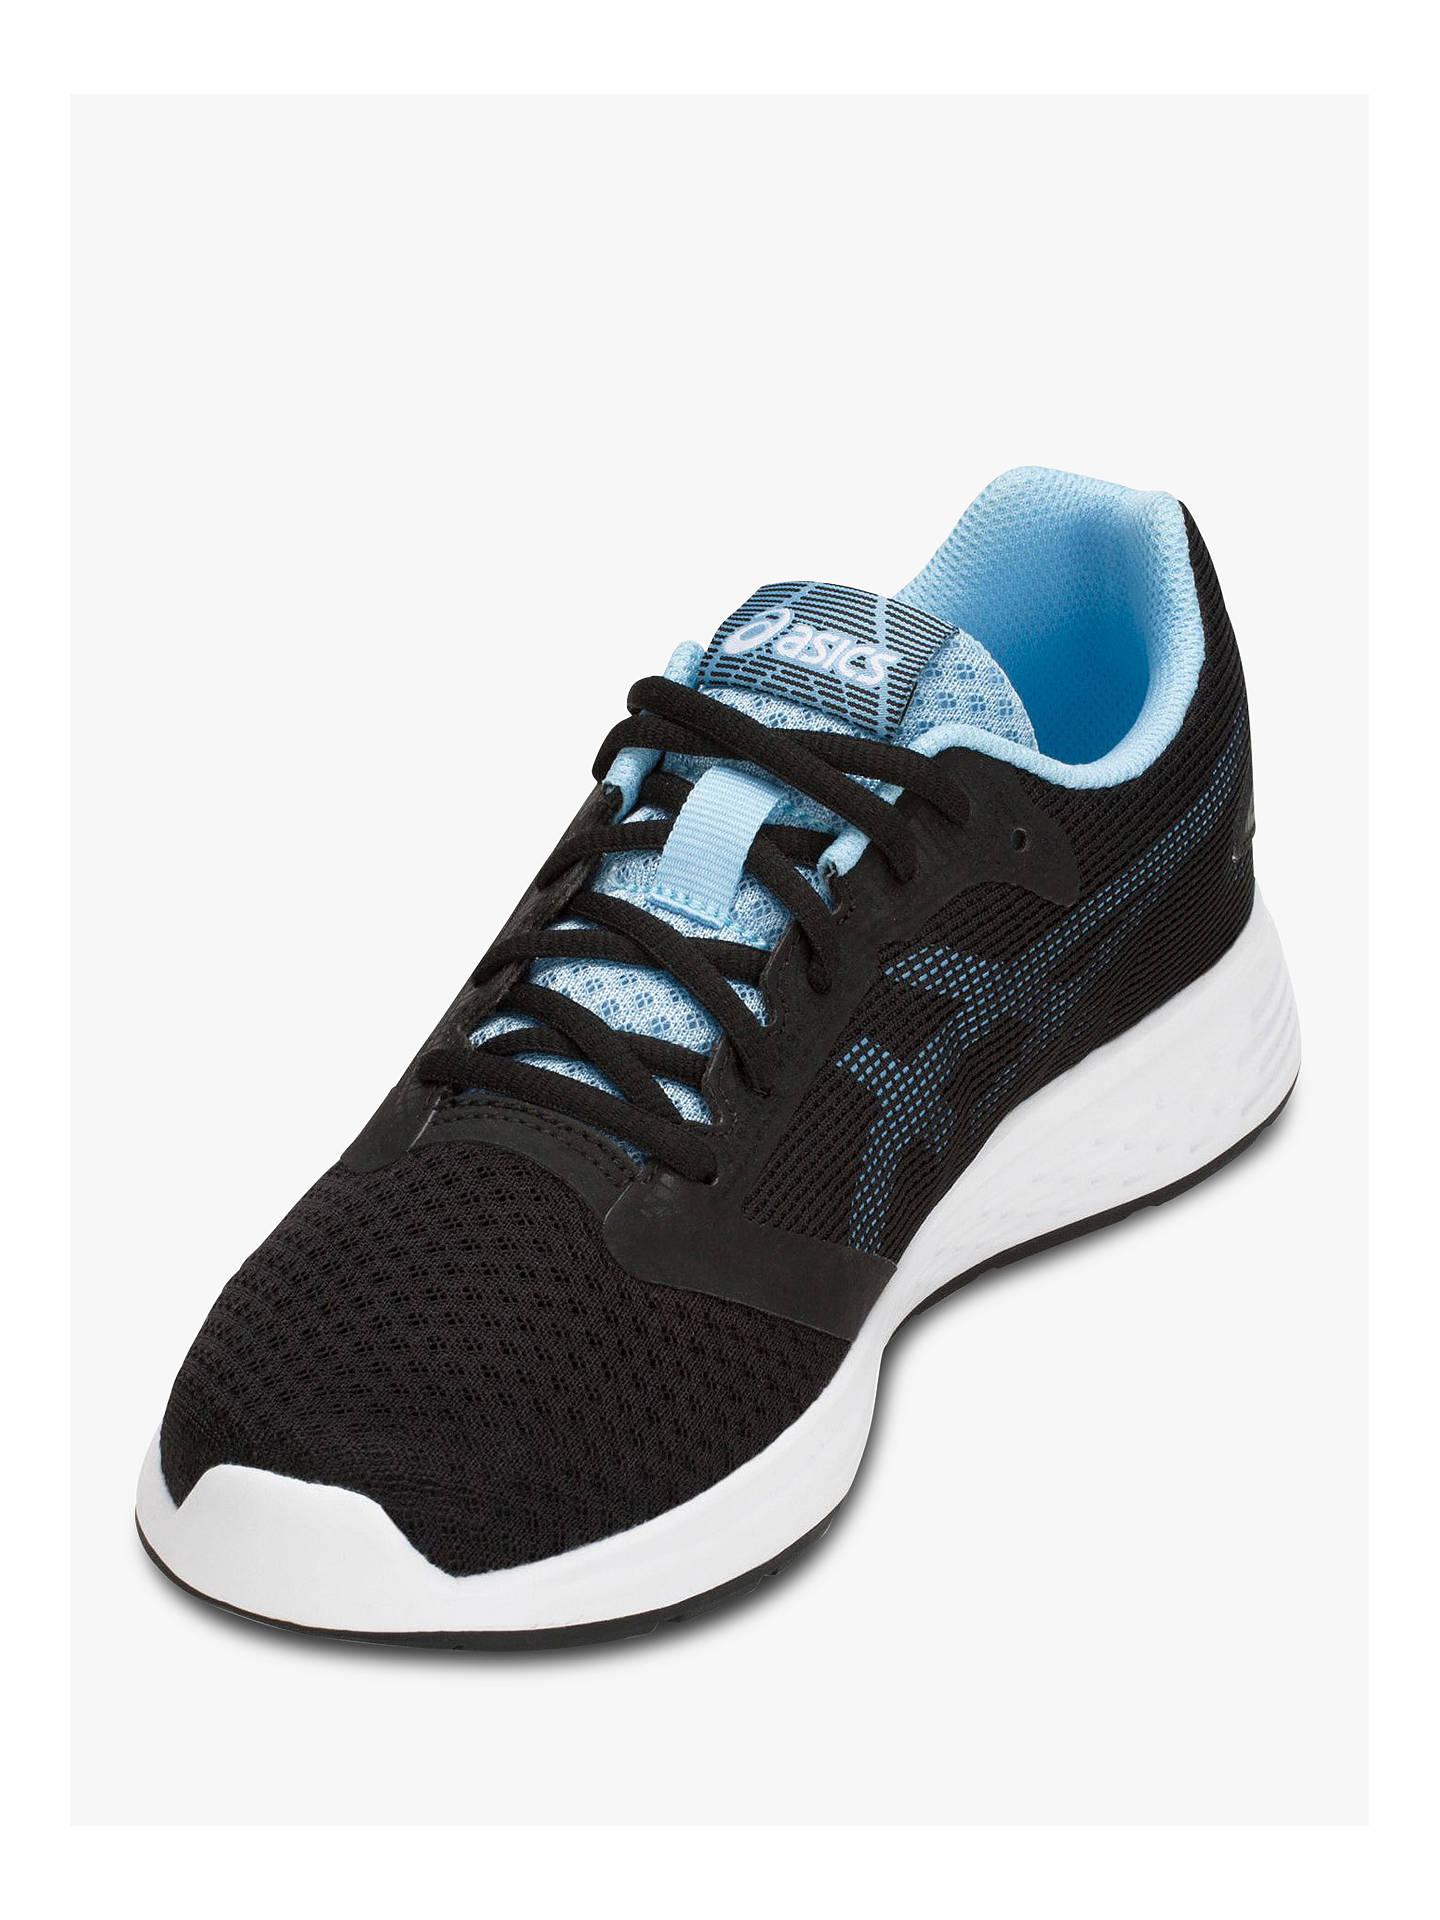 ASICS PATRIOT 10 Women's Running Shoes, BlackSkylight